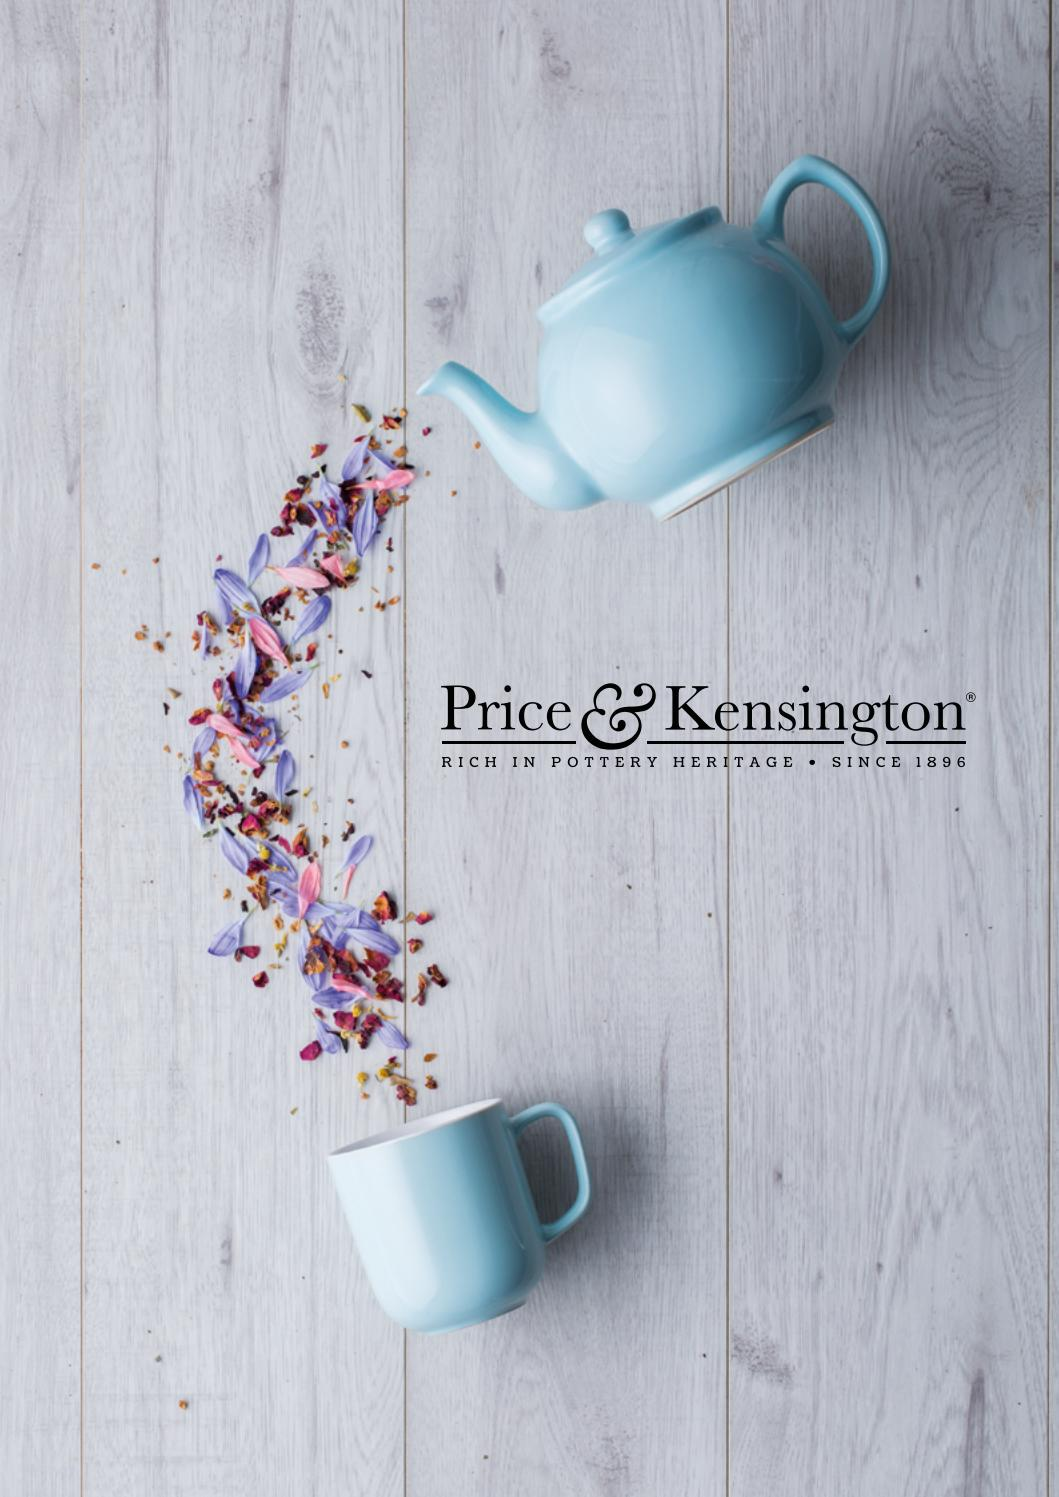 White 6.3 x 4.7 x 6.3 cm Price and Kensington Simplicity Egg Cup Porcelain